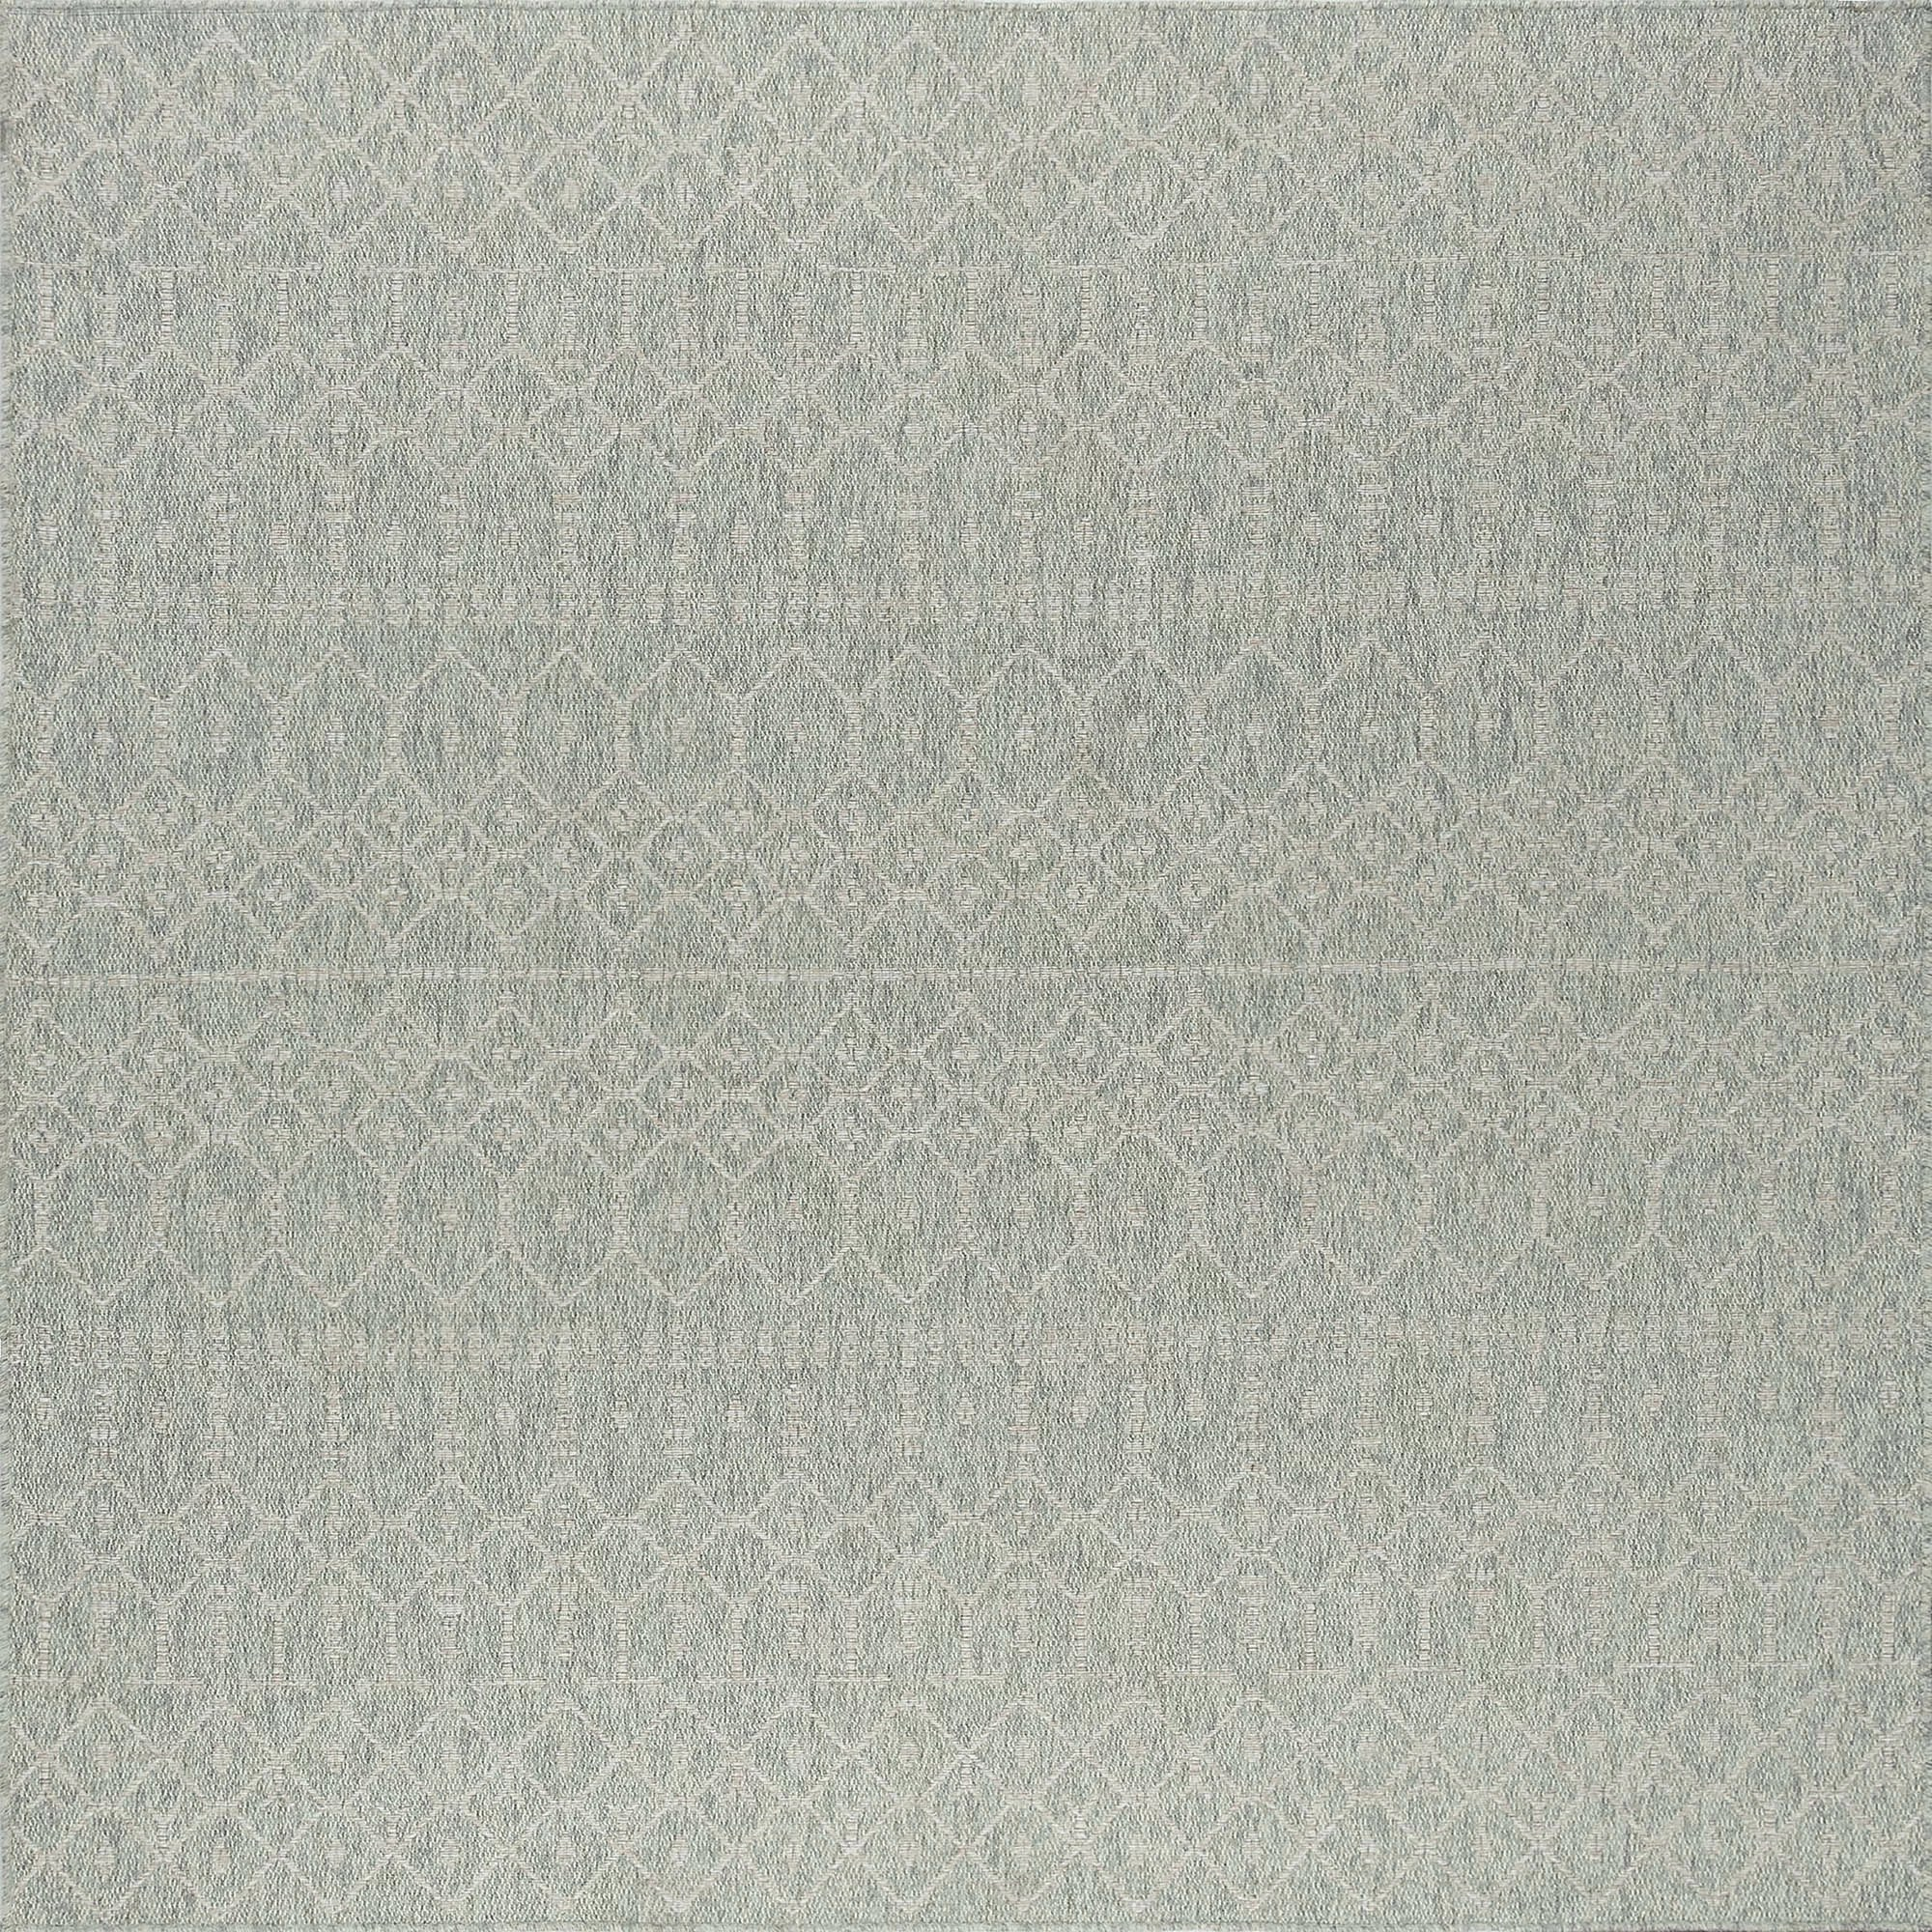 Union Rustic Bourke Gray Area Rug